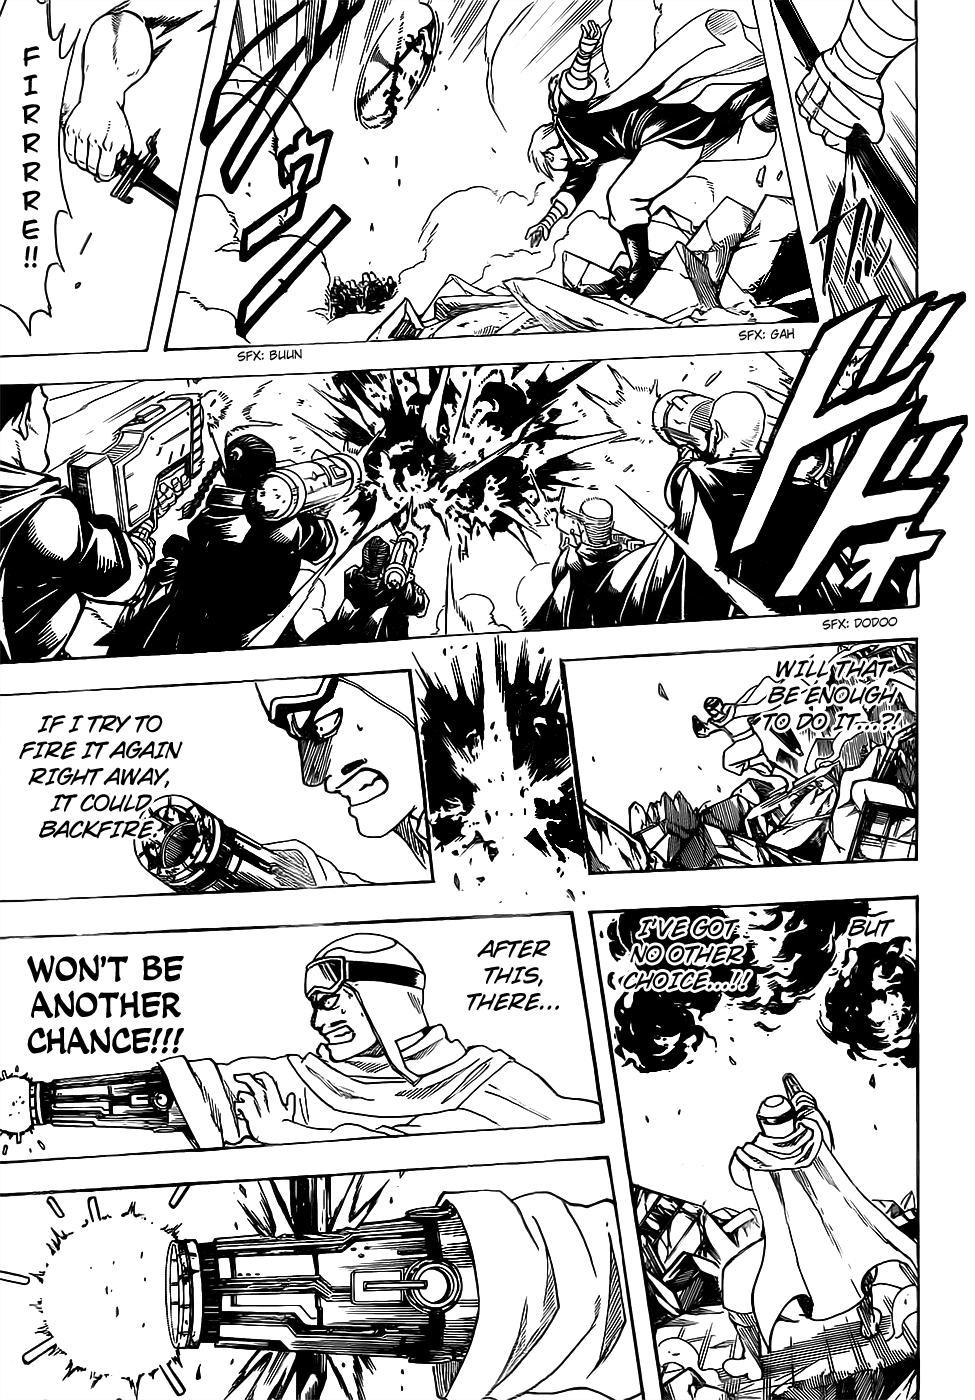 Gintama - Chapter 664